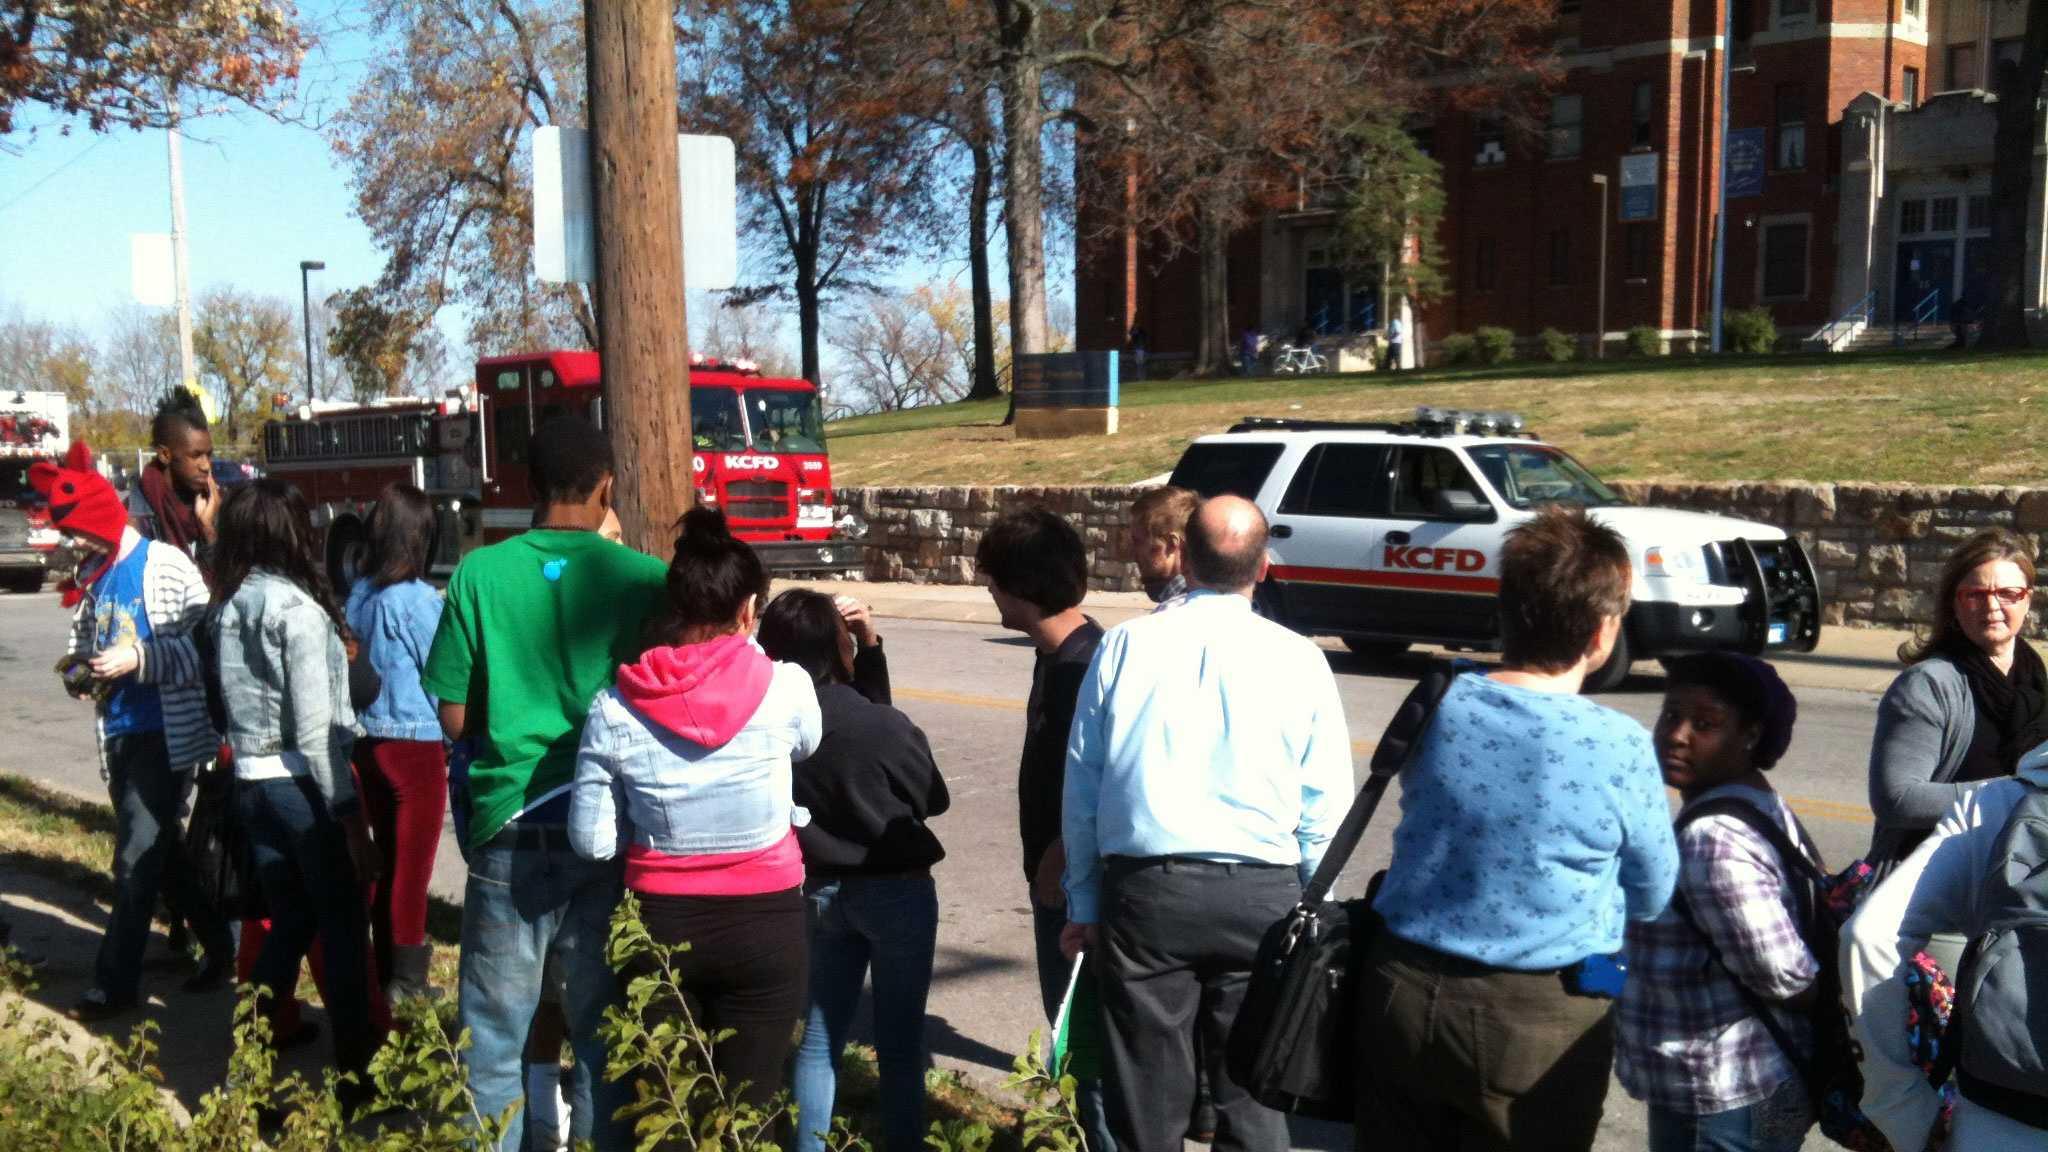 Lincoln College Prep evacuation